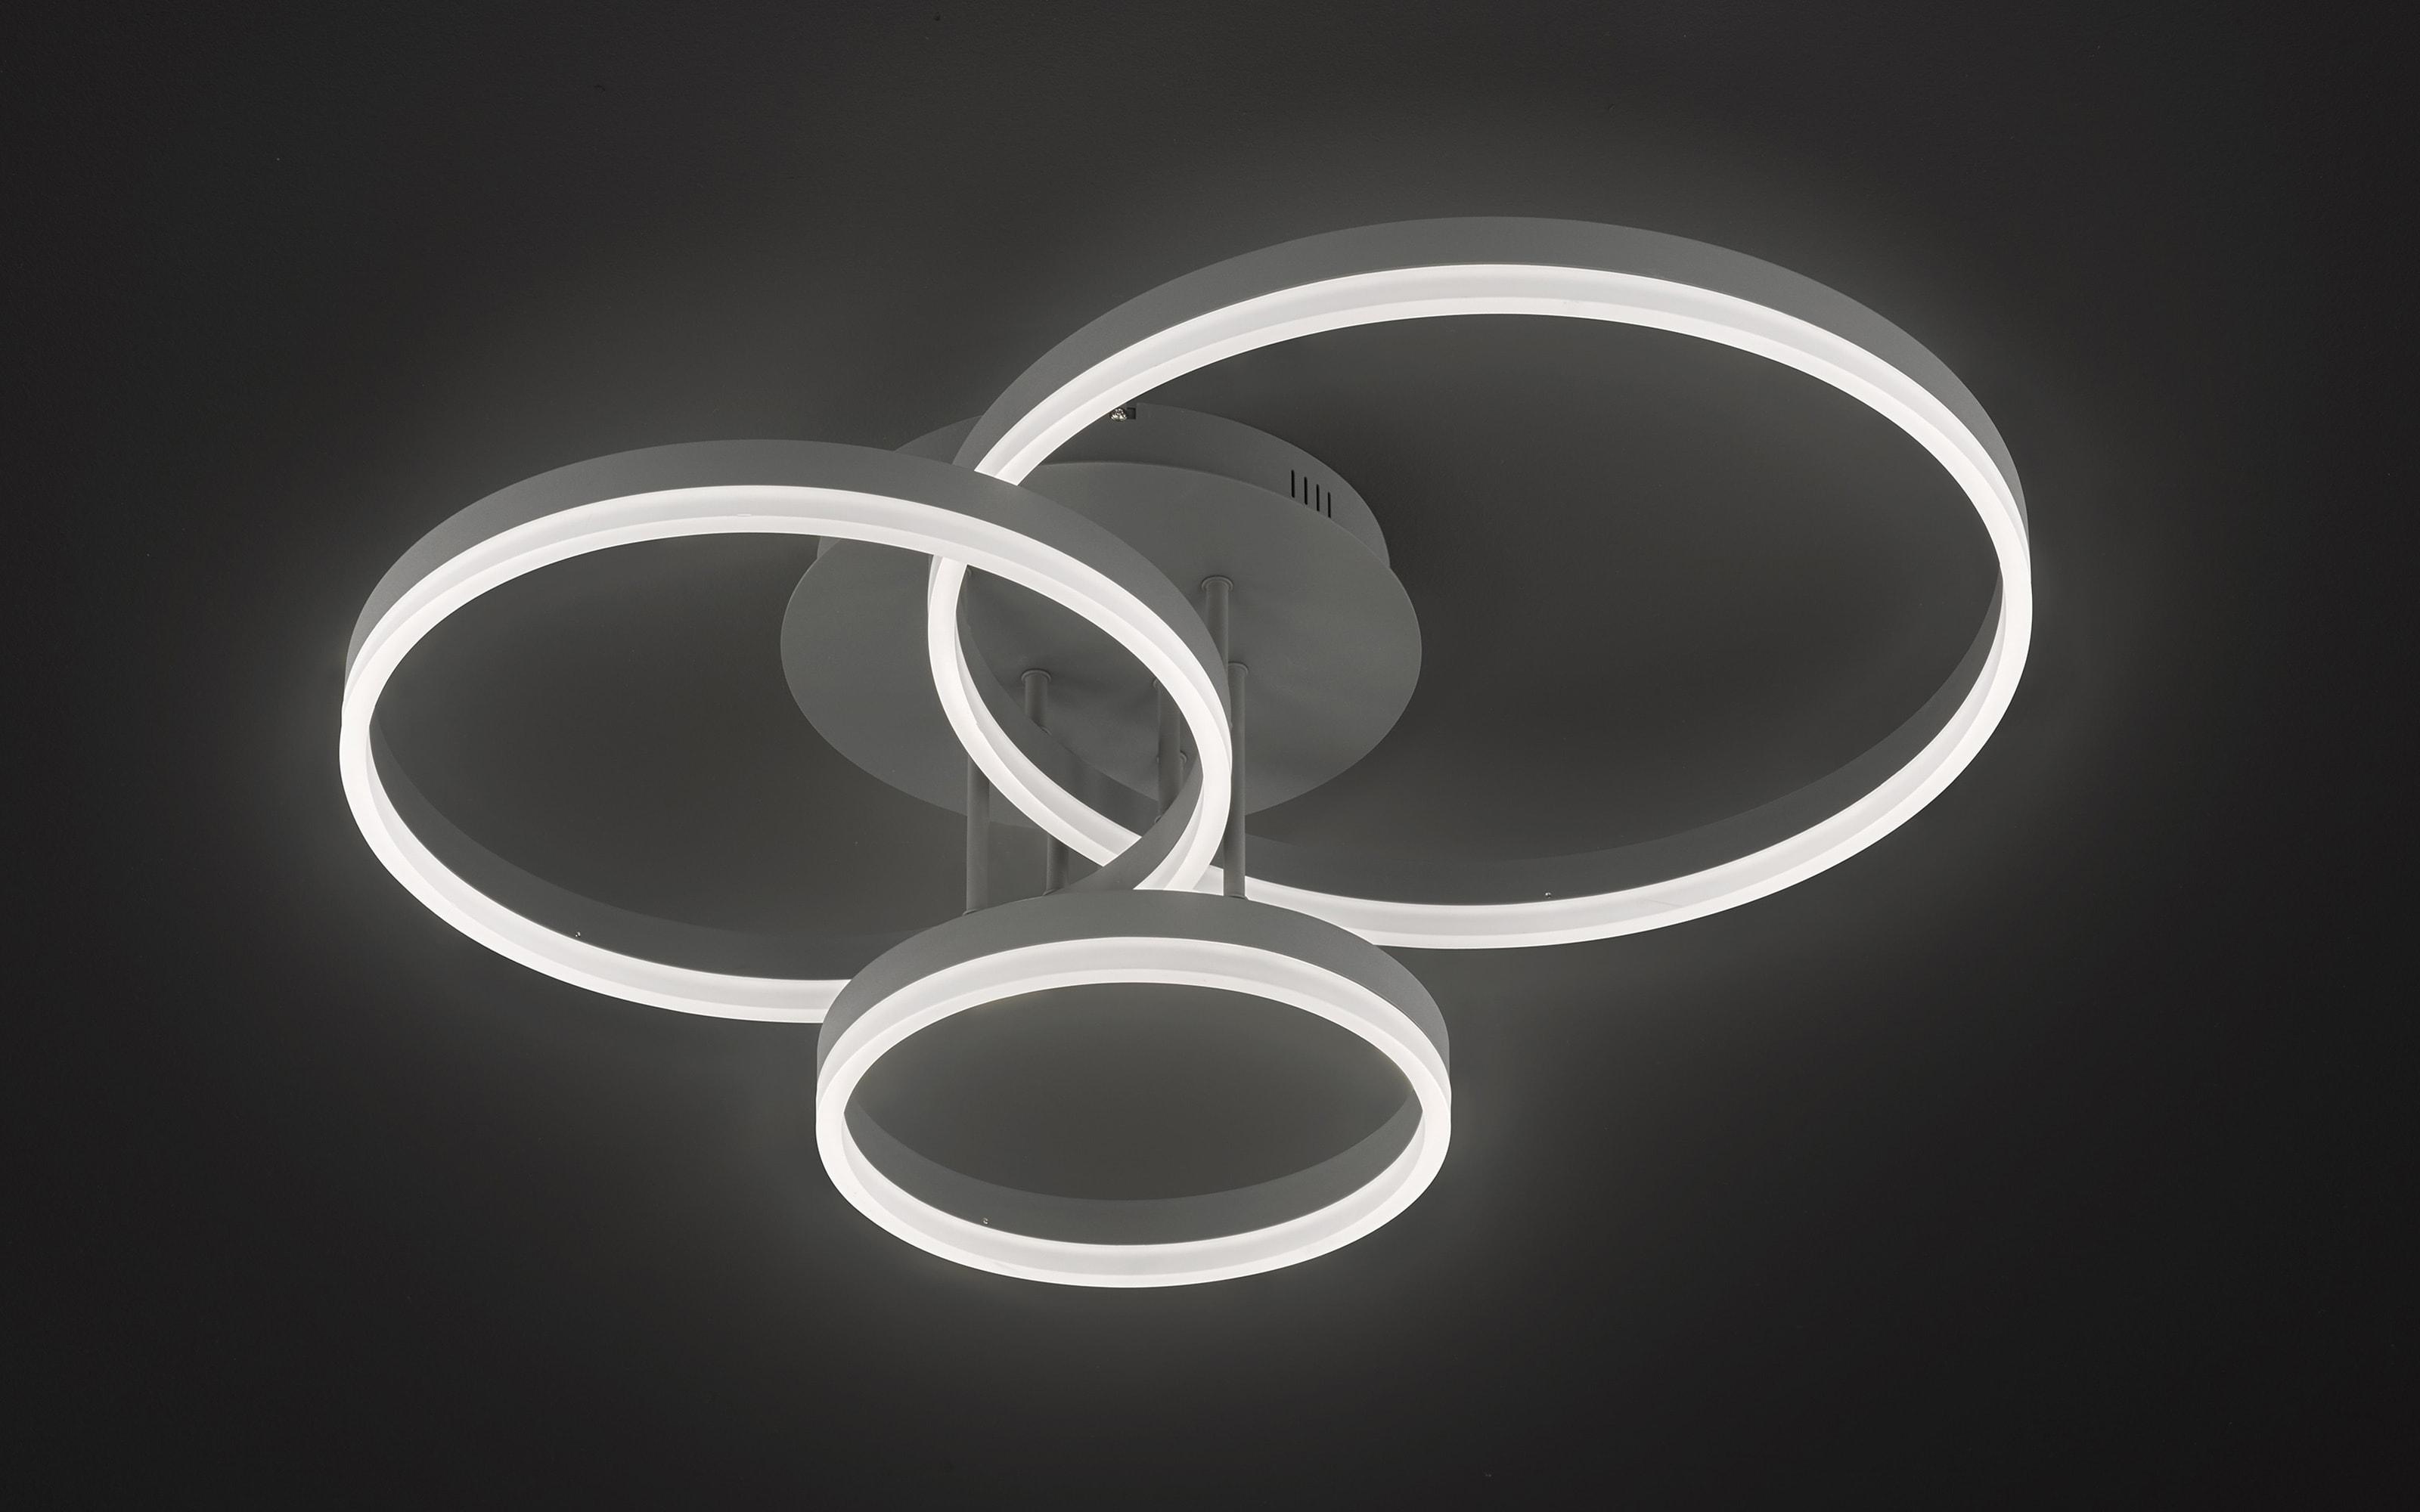 LED-Deckenleuchte Vaasa in dunkelgrau, 3-flammig